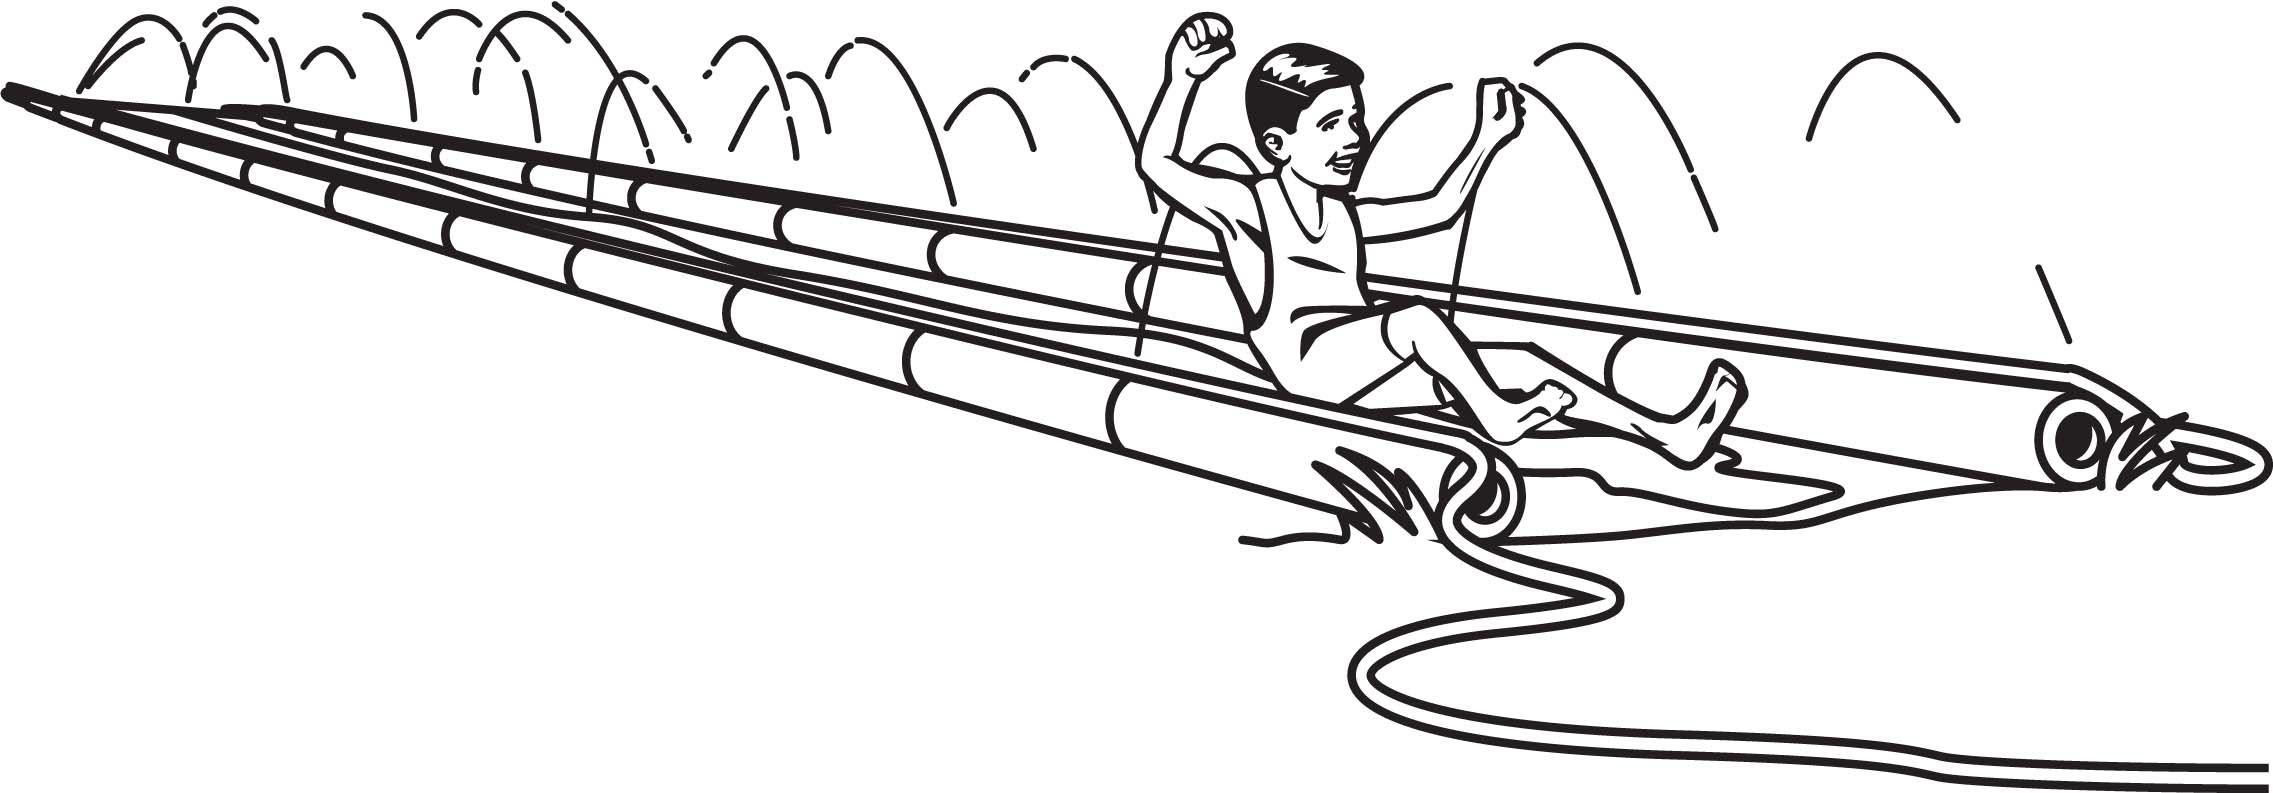 Build An Awesome Diy Slip N Slide For Summer Fun Slip N Slide